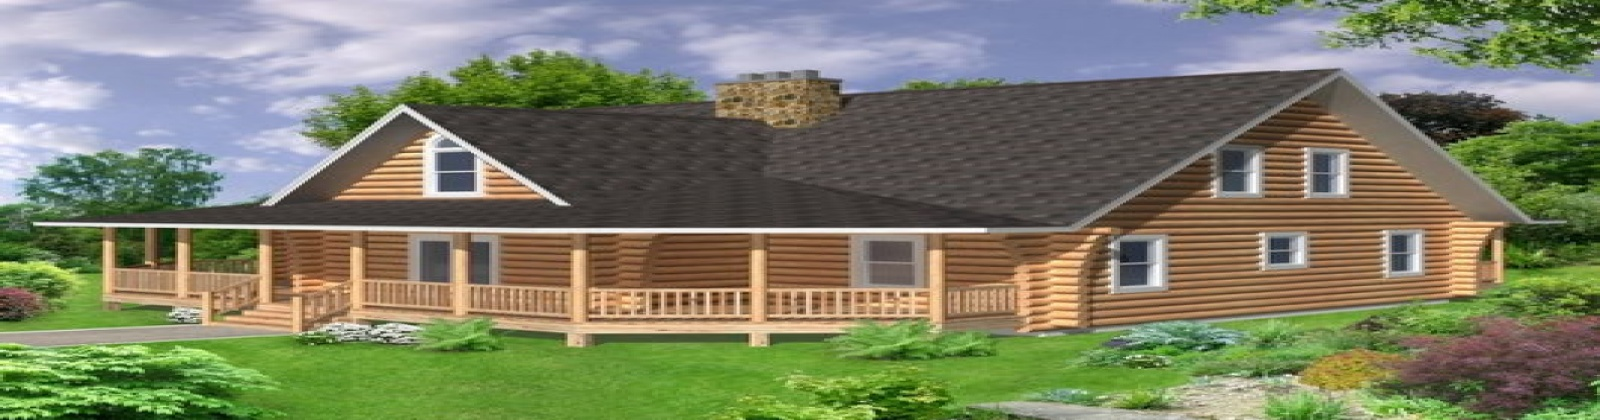 Michigan,United States,Log Home,1053